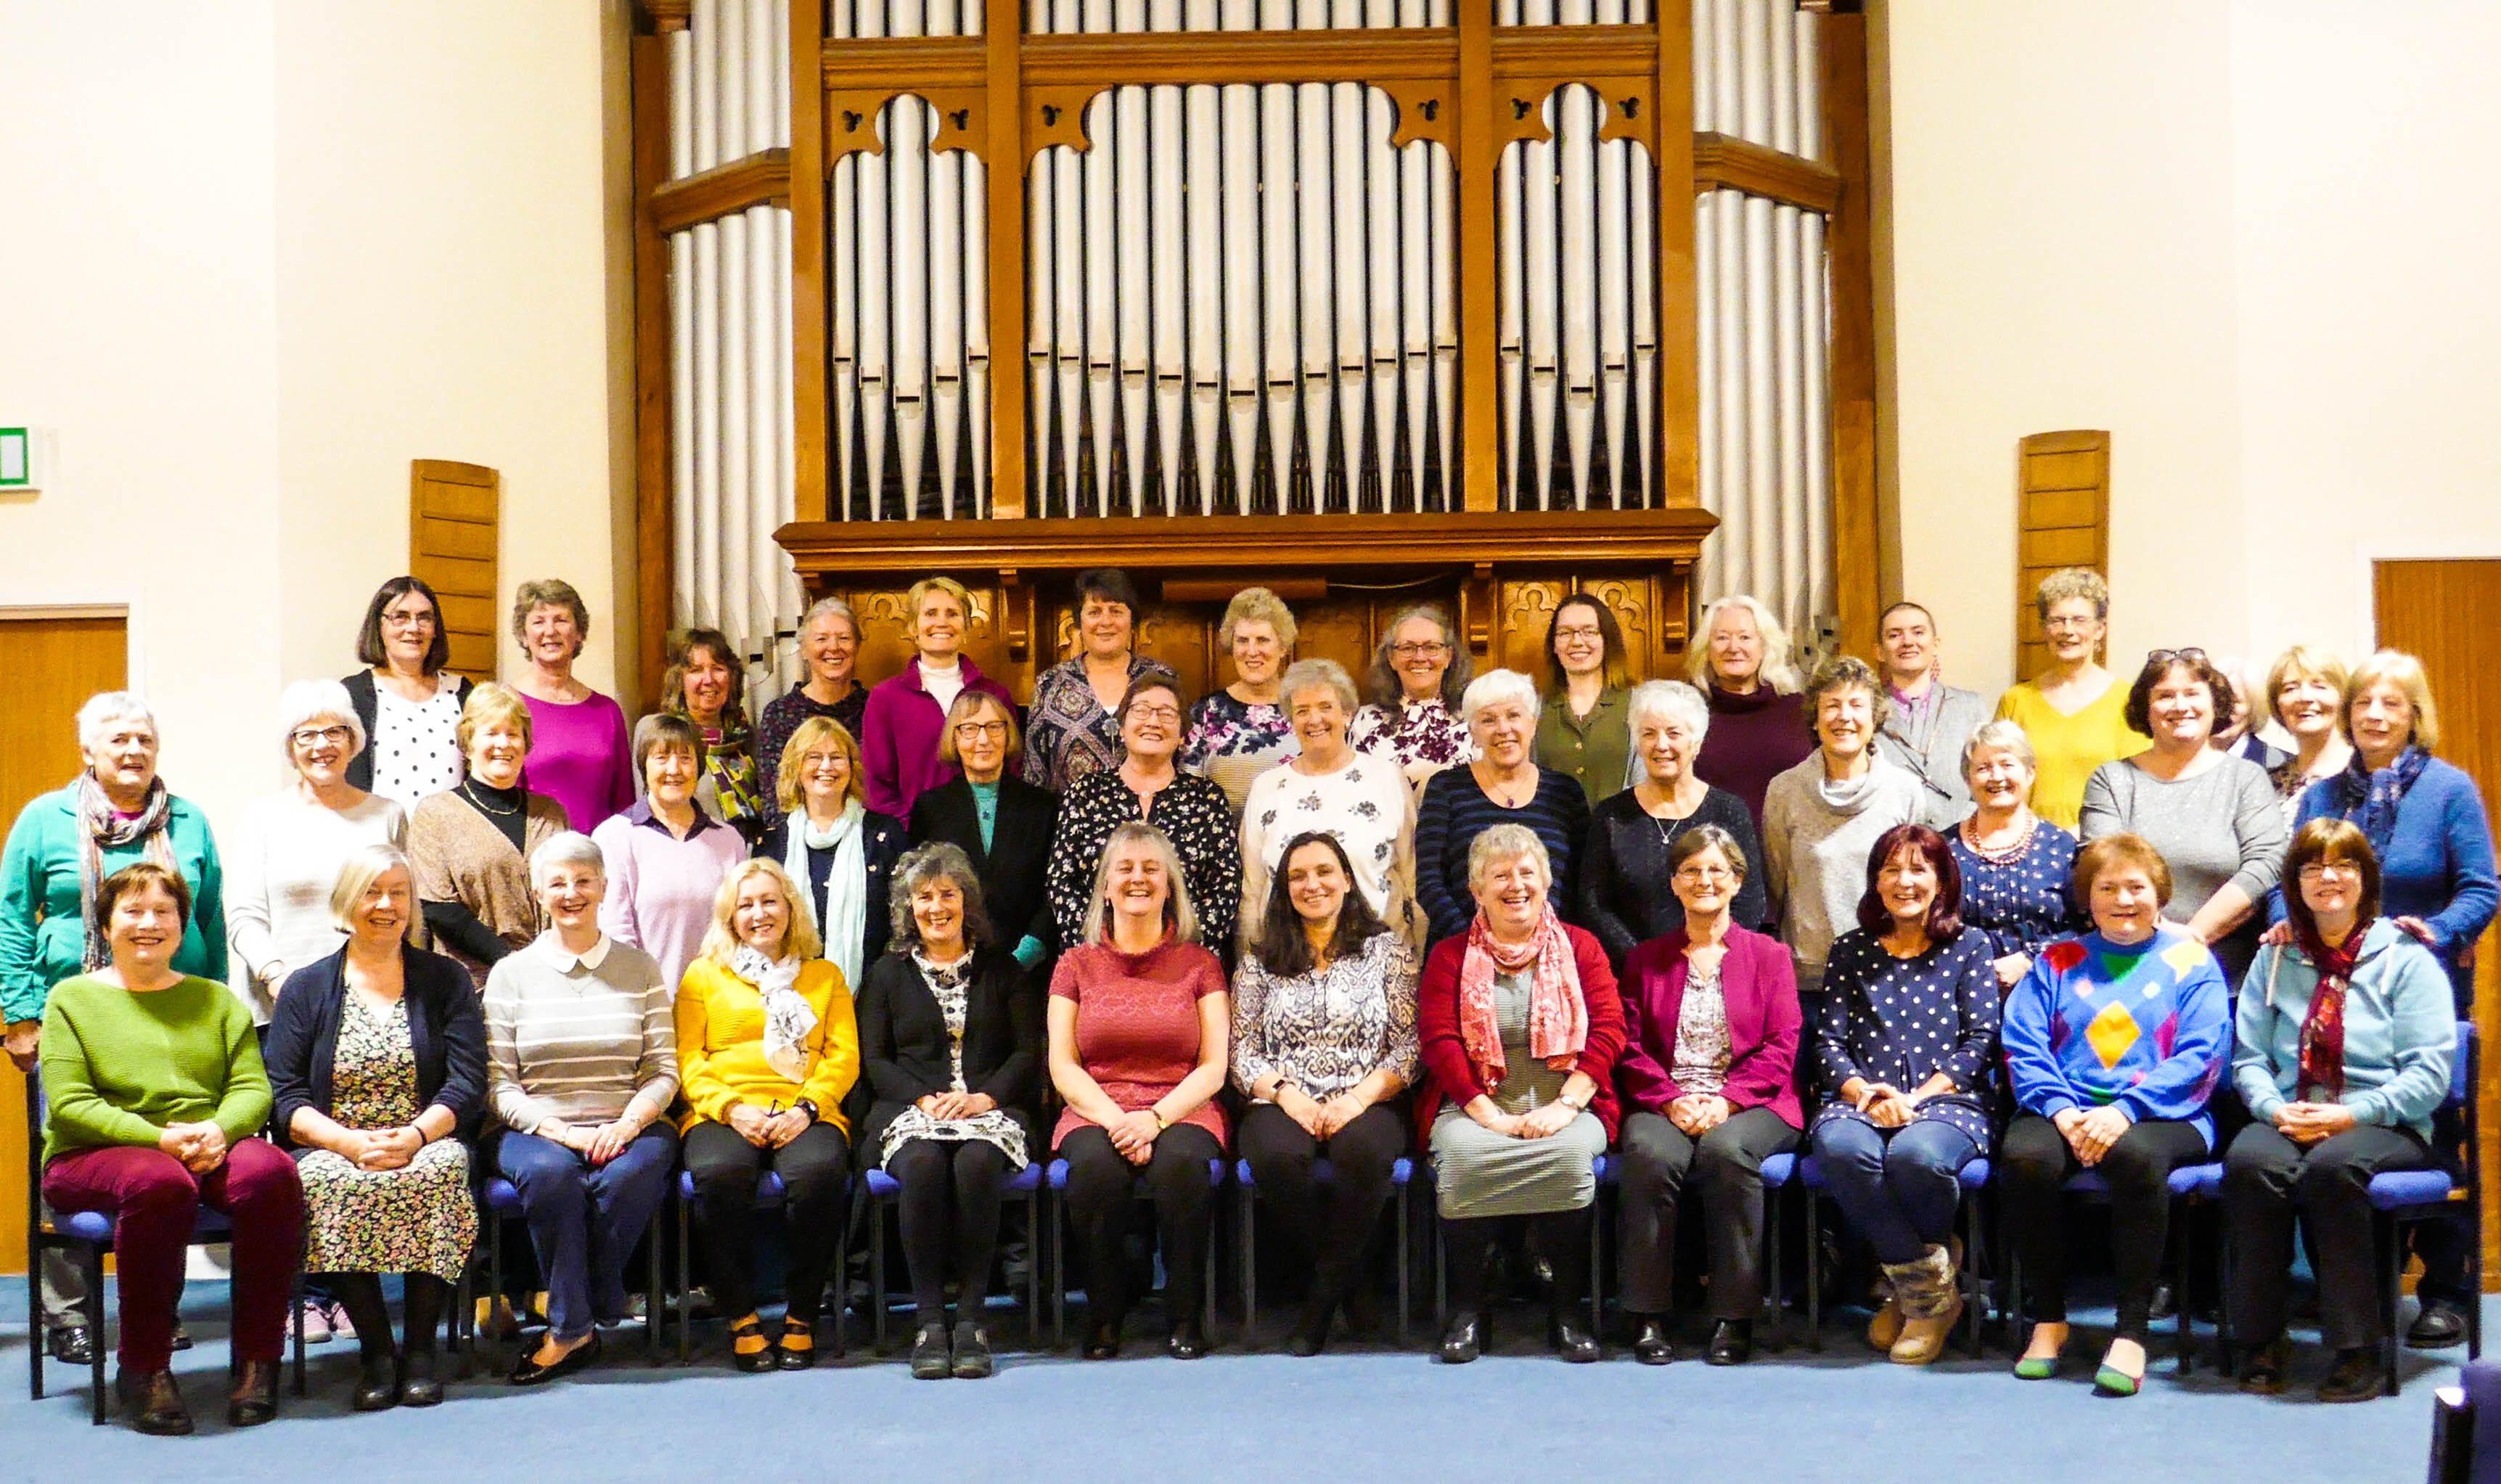 Castlegate Singers Choir 2018